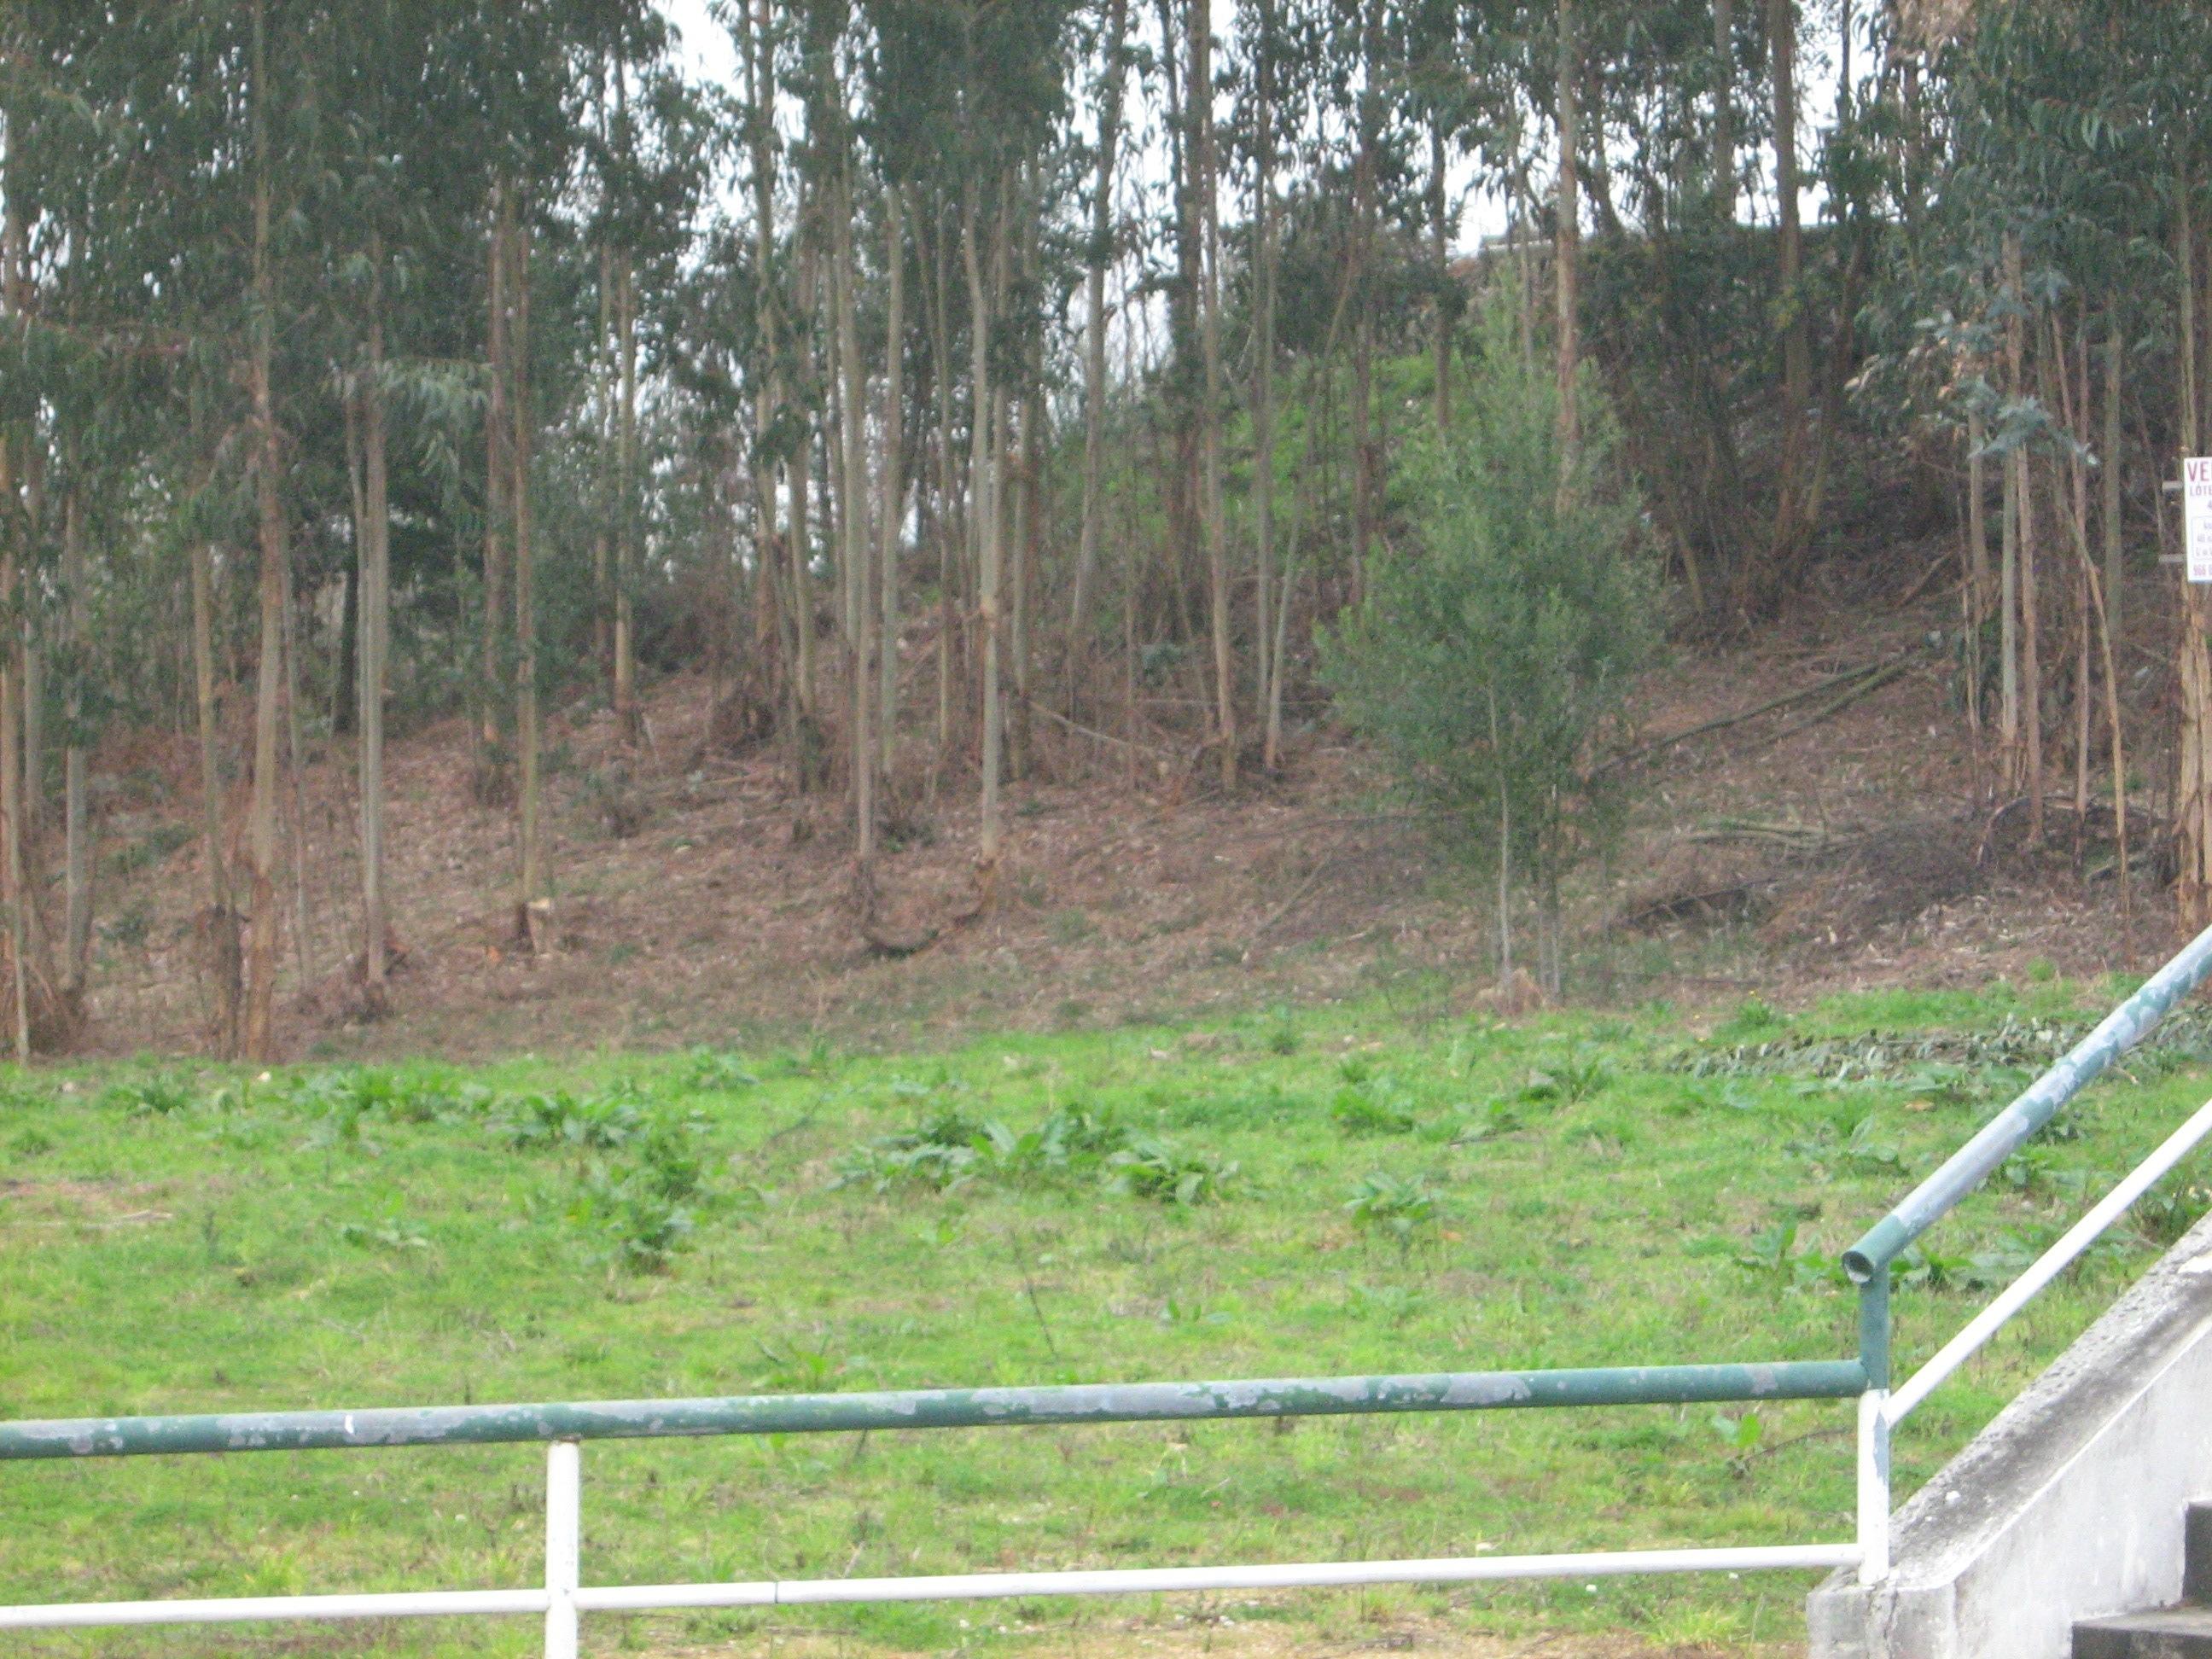 Lotes para moradias de 4 frentes, junto ao estádio Jorge Sampaio – Complexo Desportivo de Pedroso